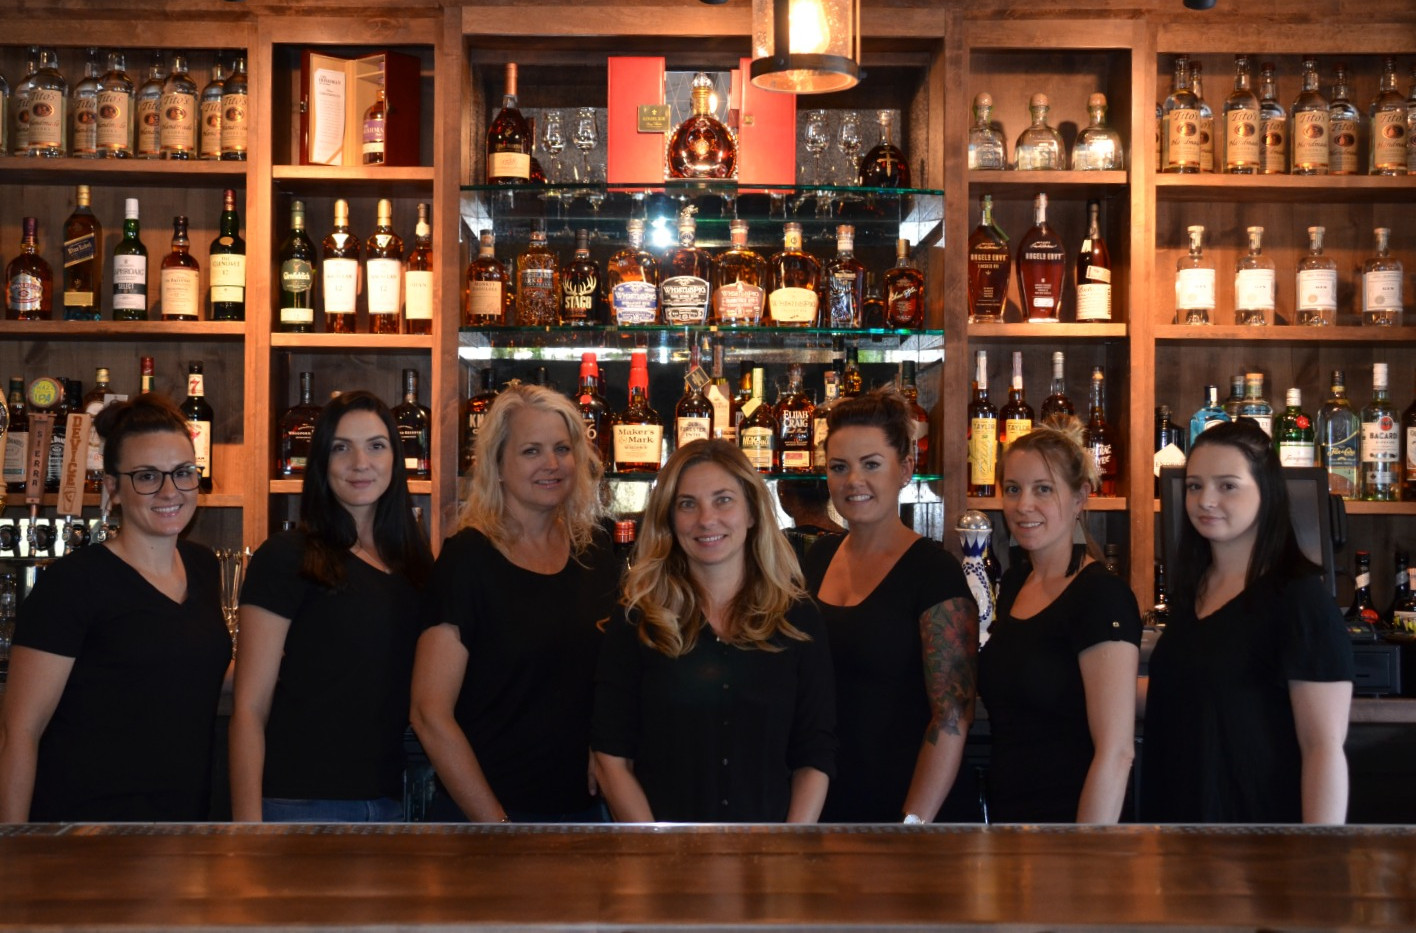 The Tin Lantern Bar & Grill. Tin Lantern Staff. Meadow Vista, CA.